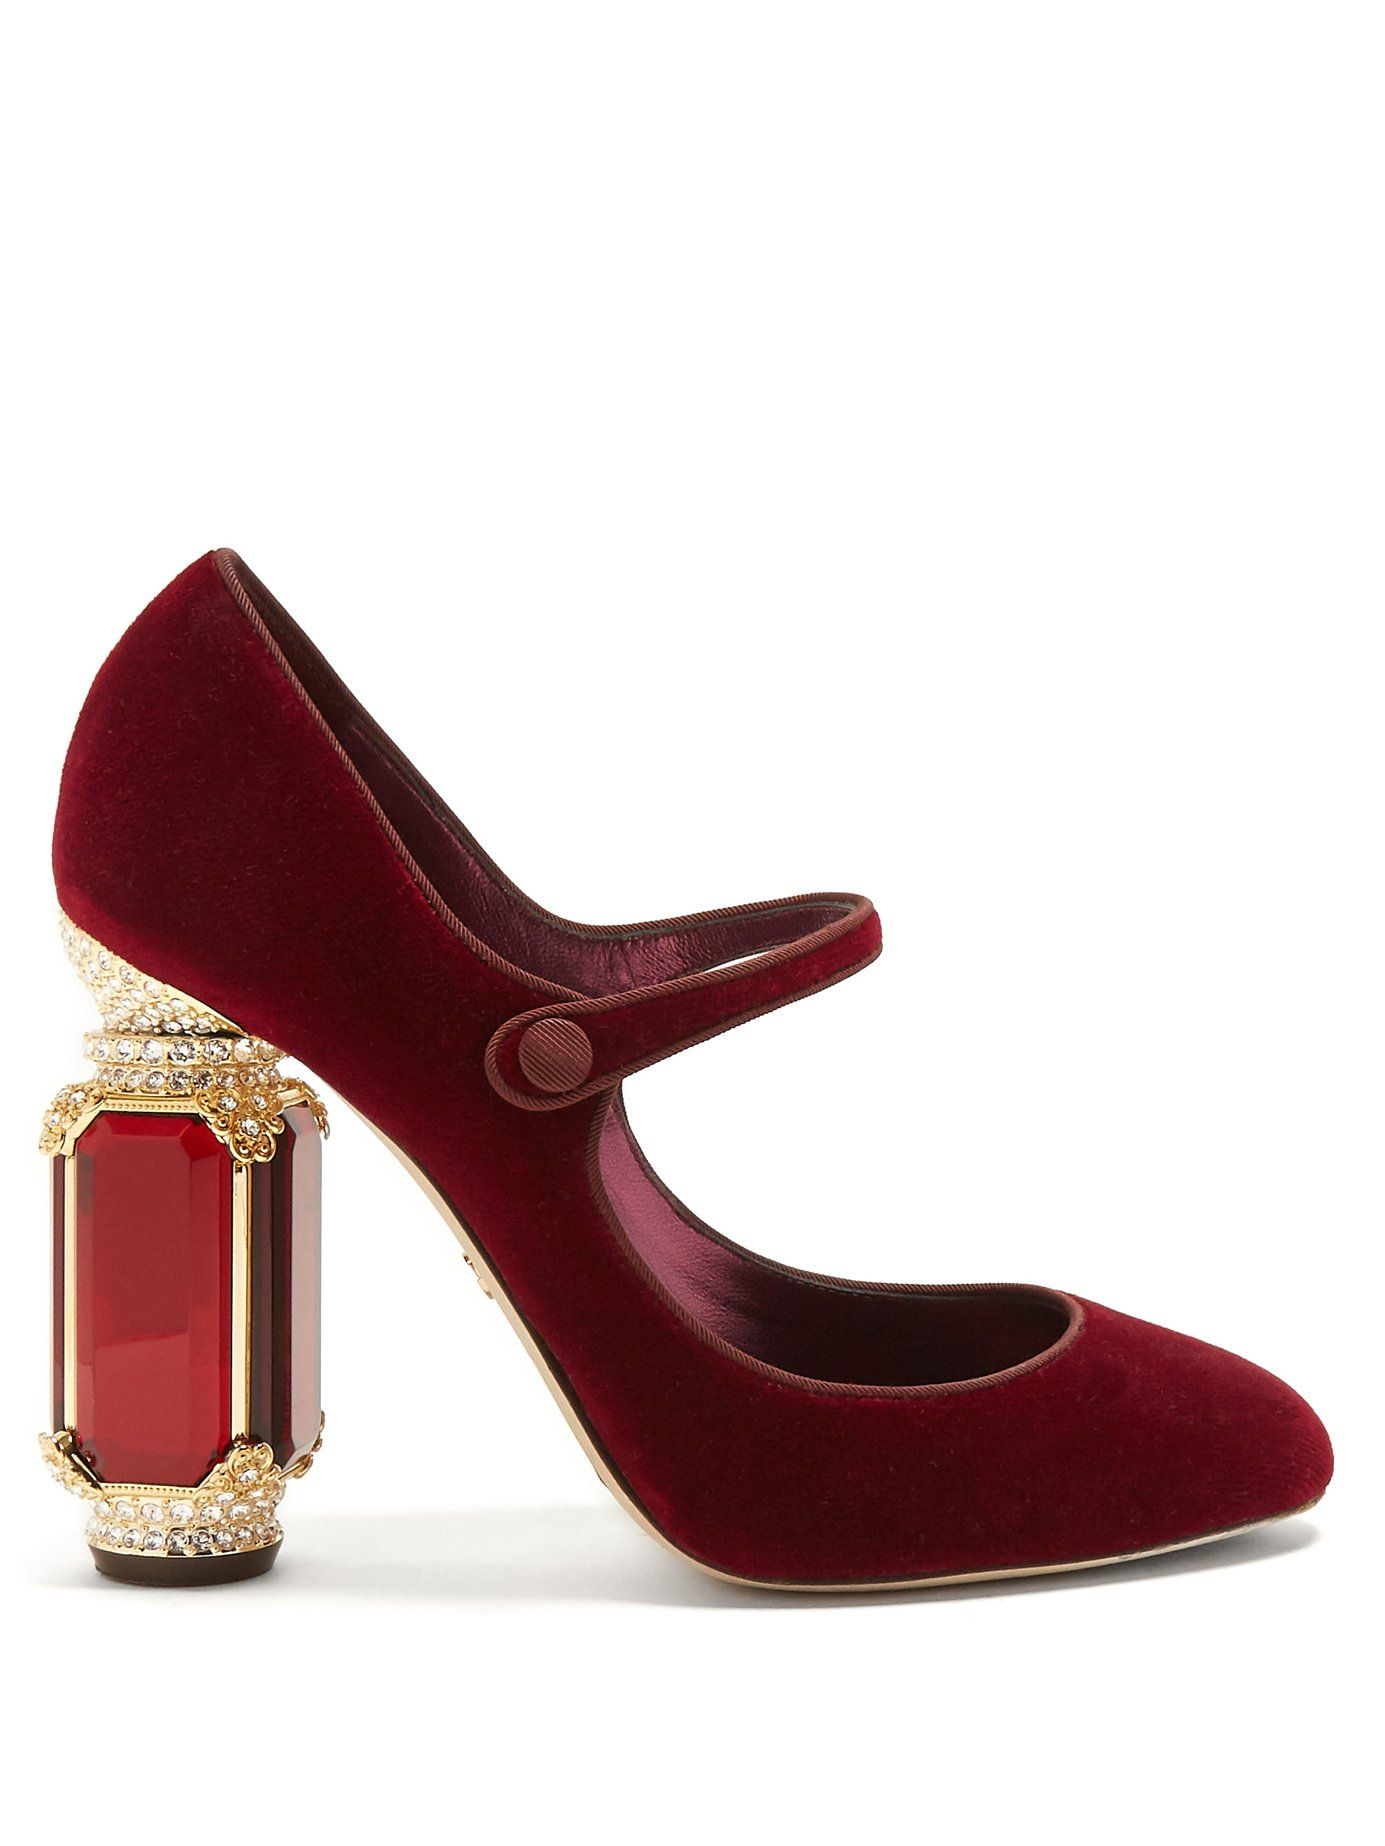 9e0b5b01df91e Crystal-embellished Mary-Jane velvet pumps | Dolce & Gabbana ...